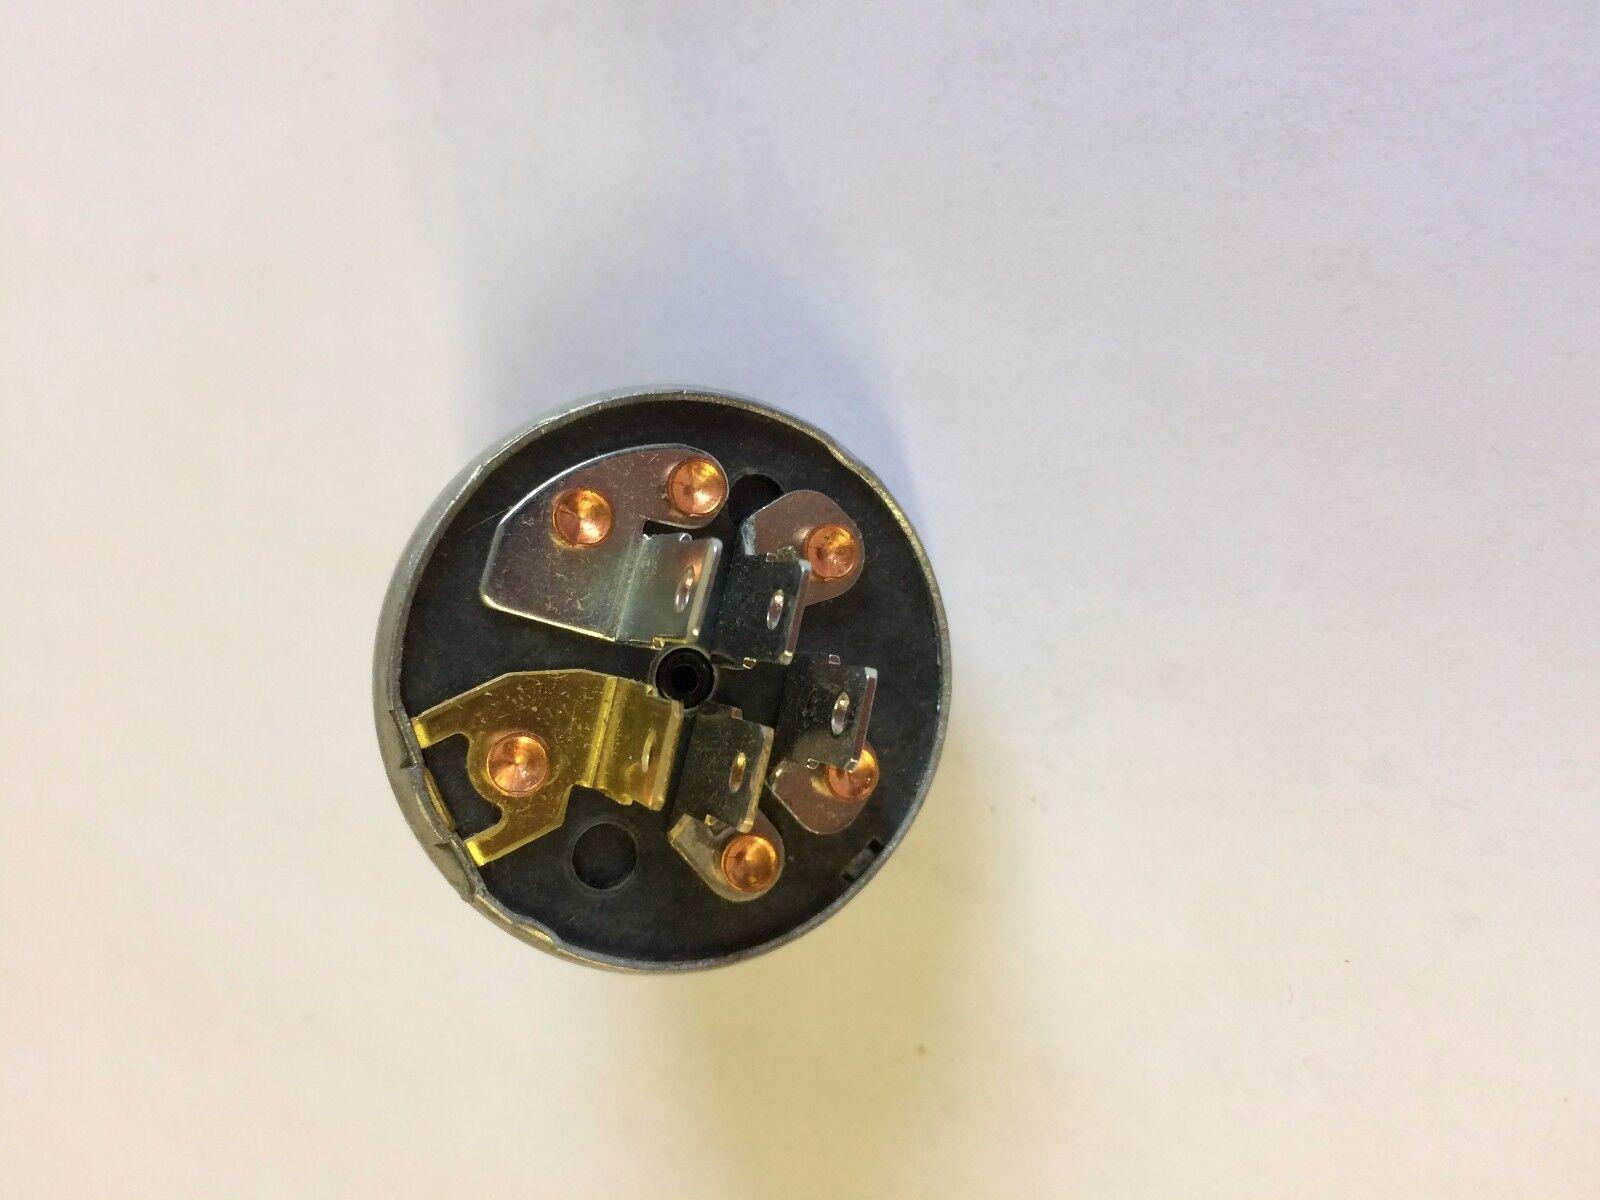 s l1600 swisher lawnmowers ebay swisher wiring harness 10299 at gsmportal.co